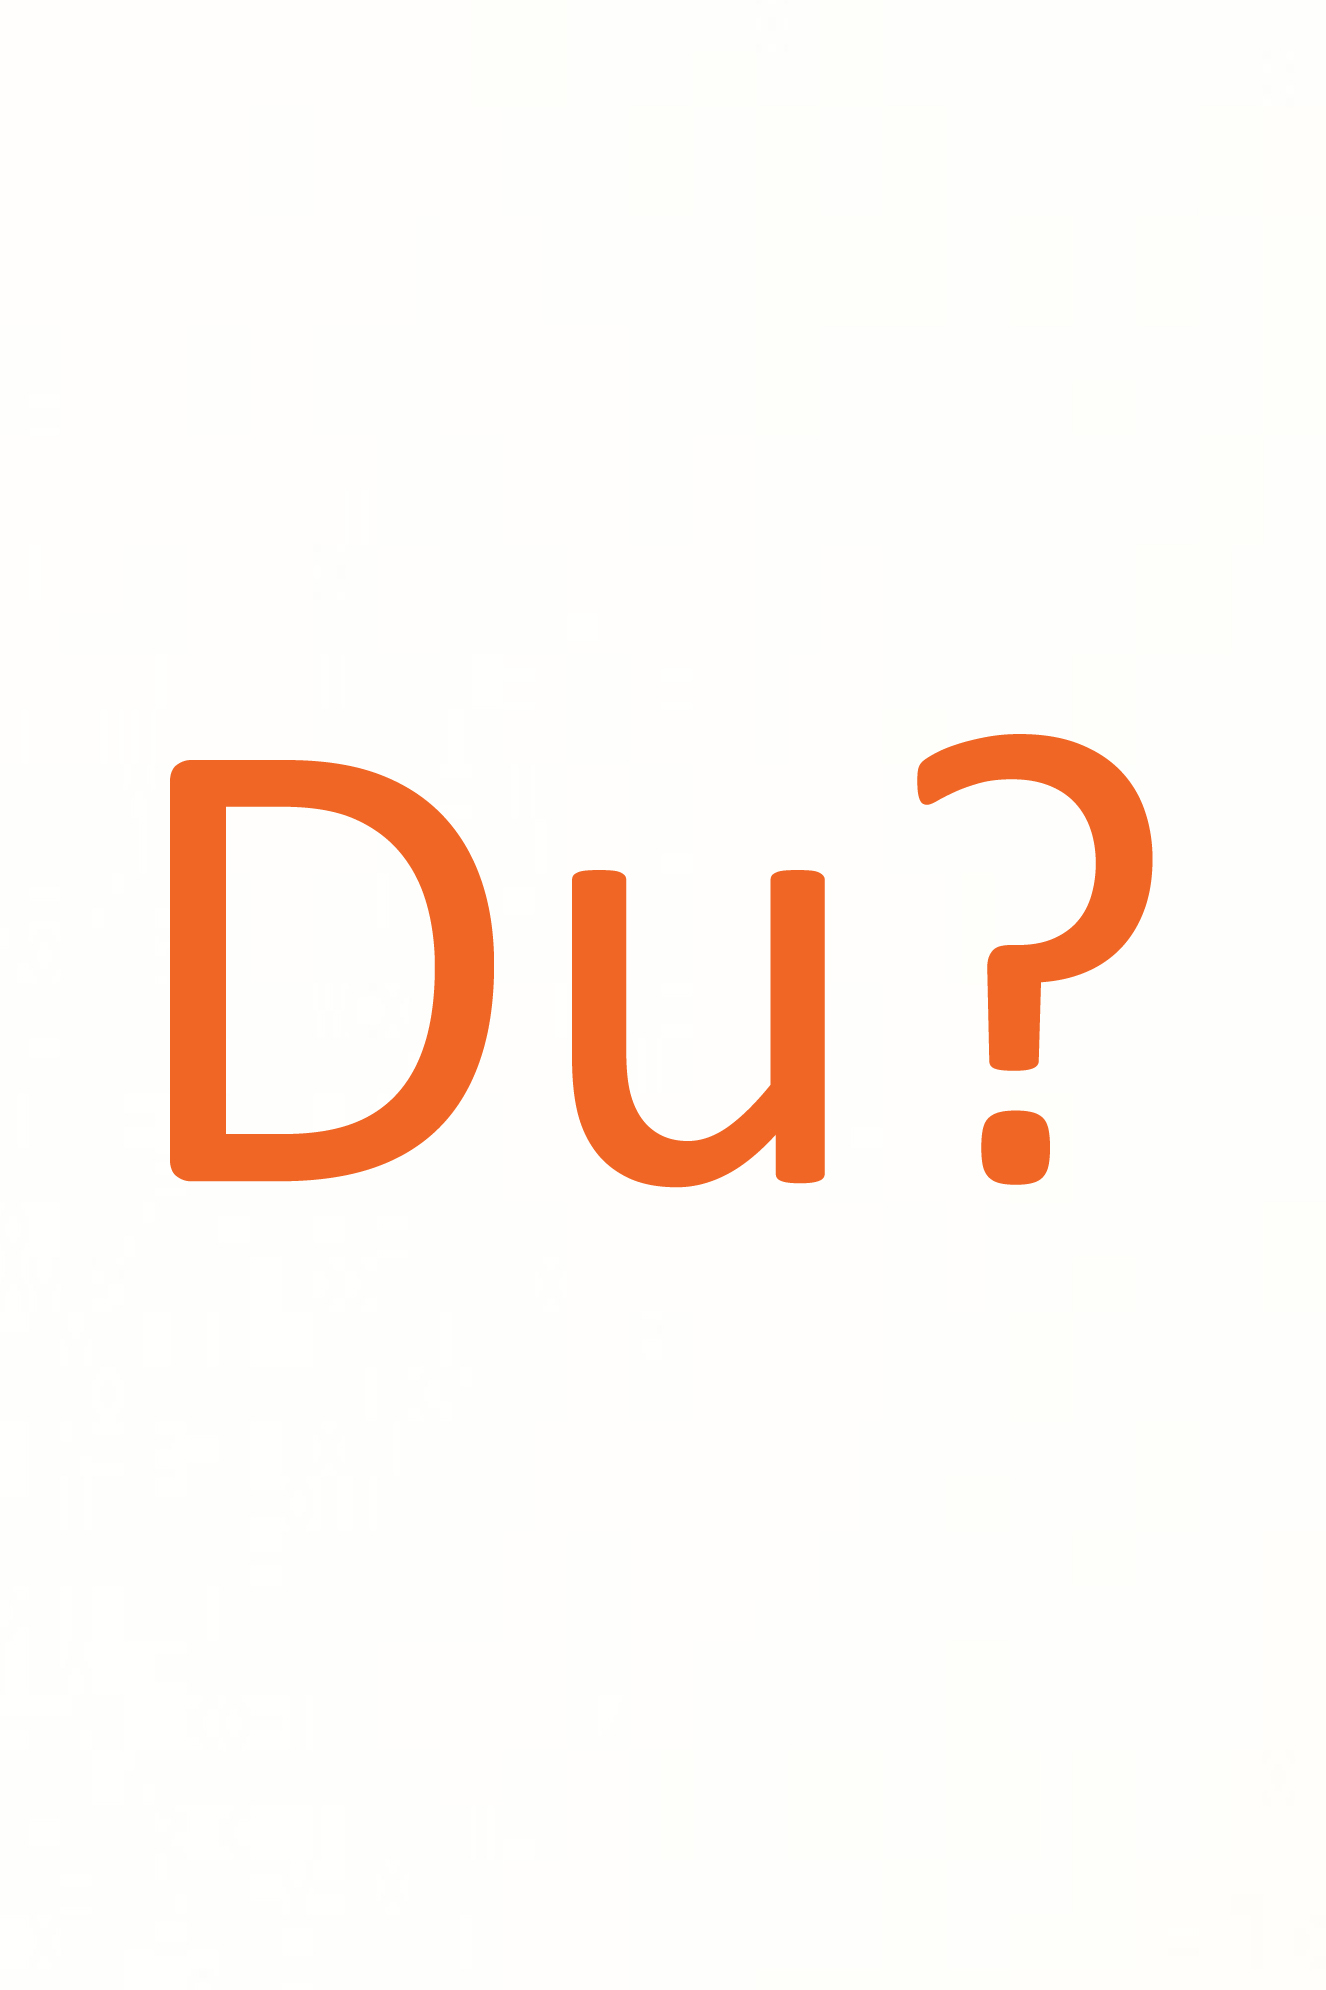 https://www.noonee.com/wp-content/uploads/2018/05/Du.jpg